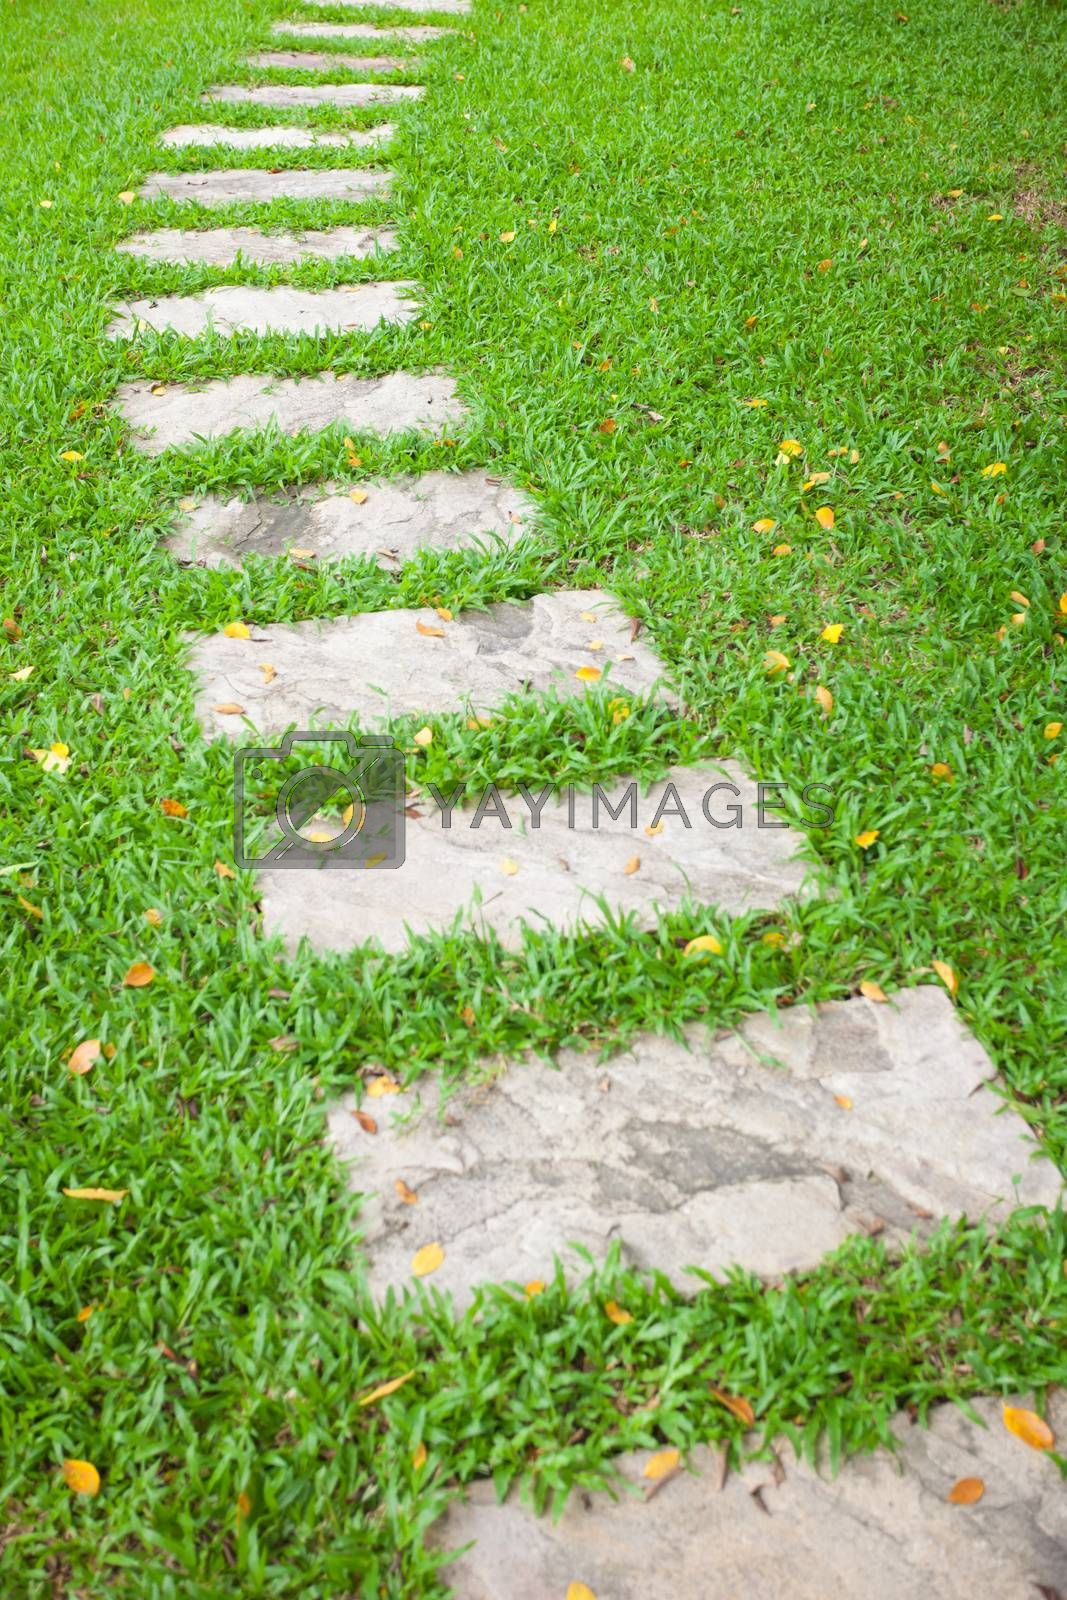 The Stone block walk path in green grass background